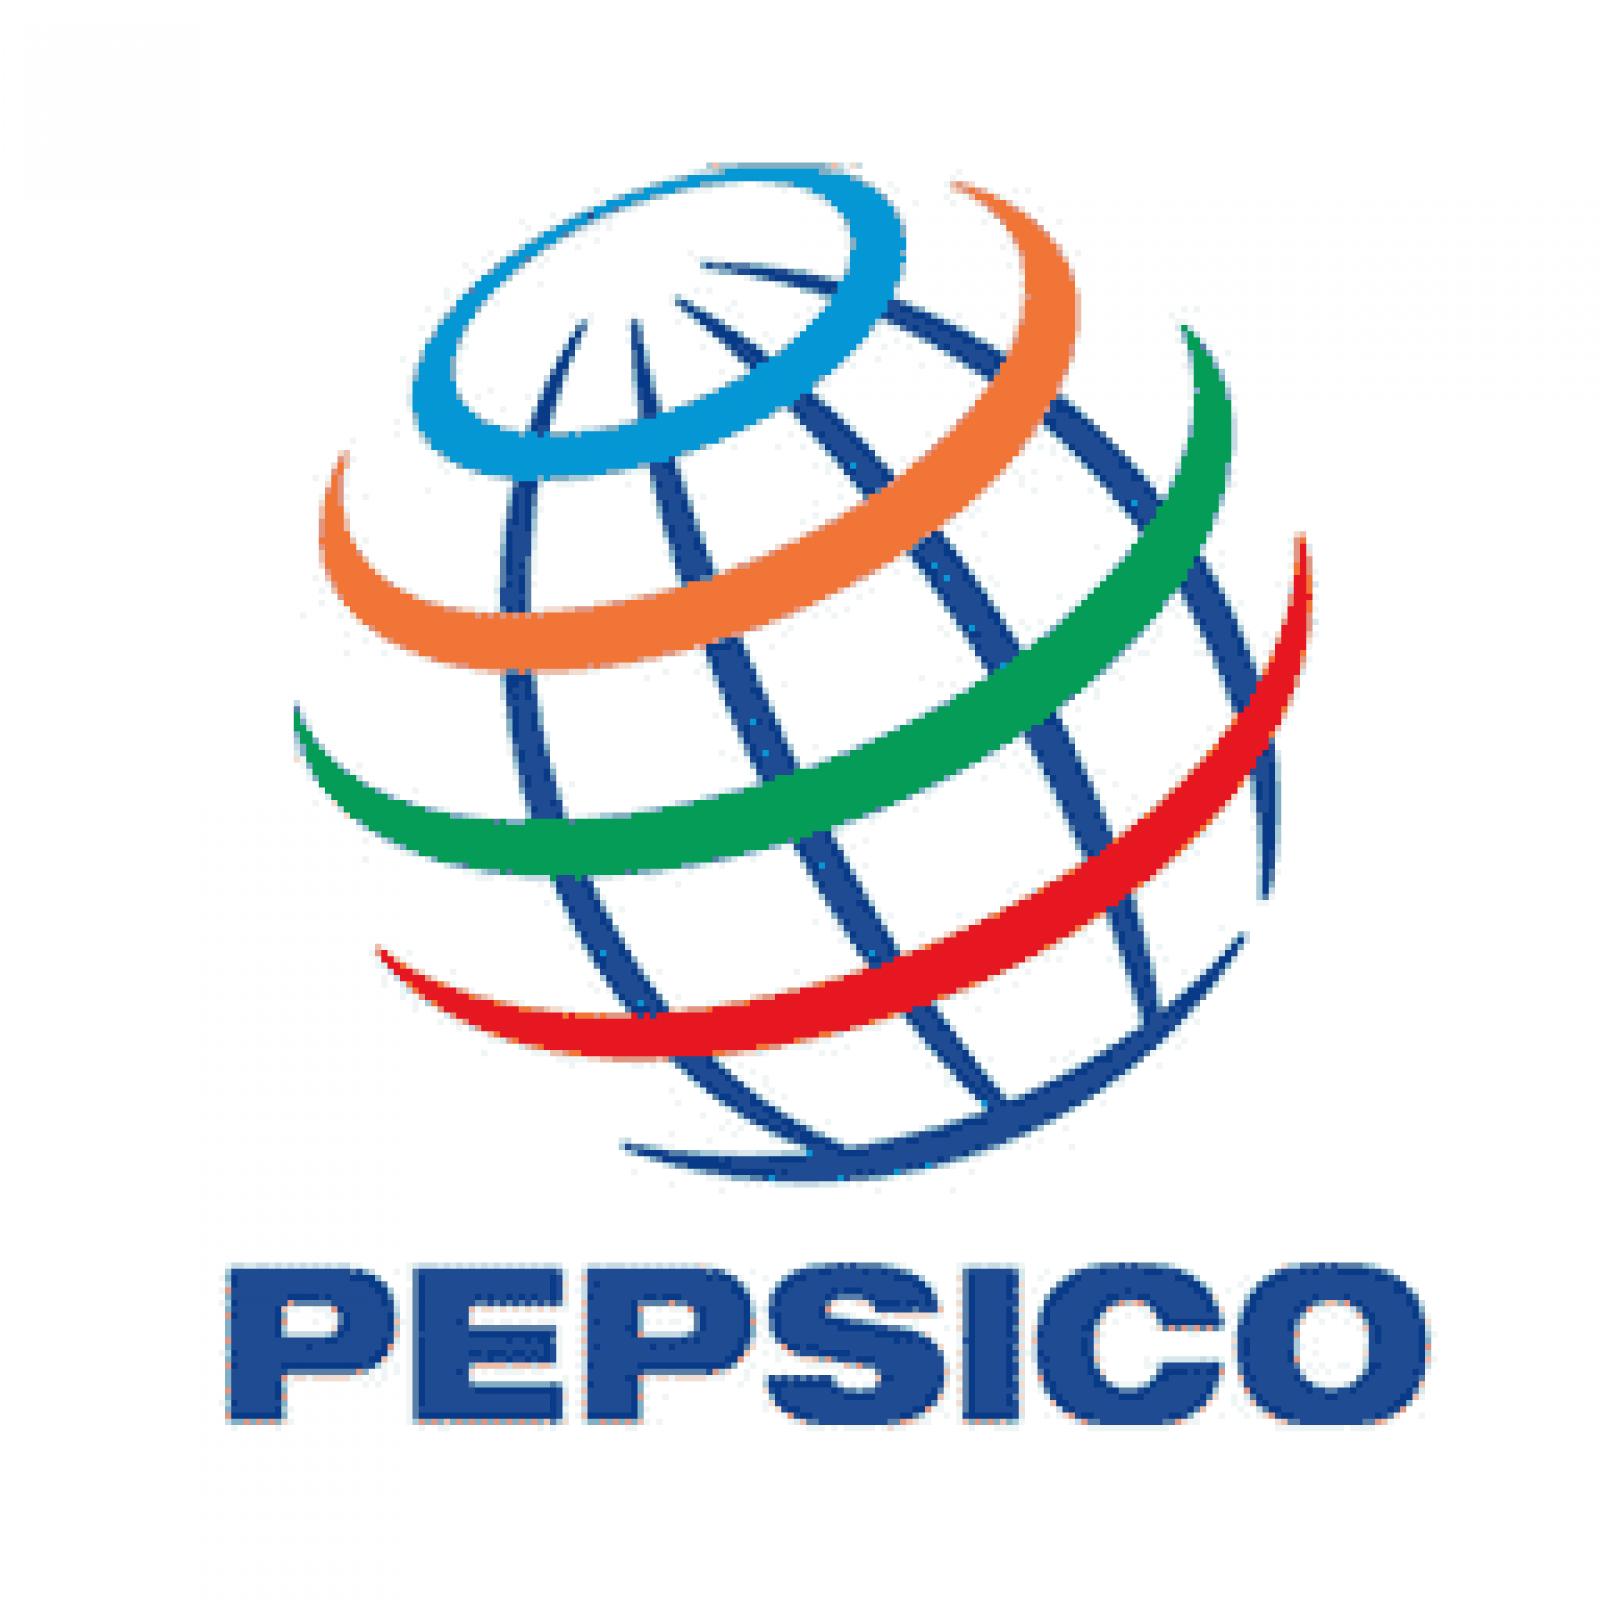 Pepsico Symbol Wallpaper